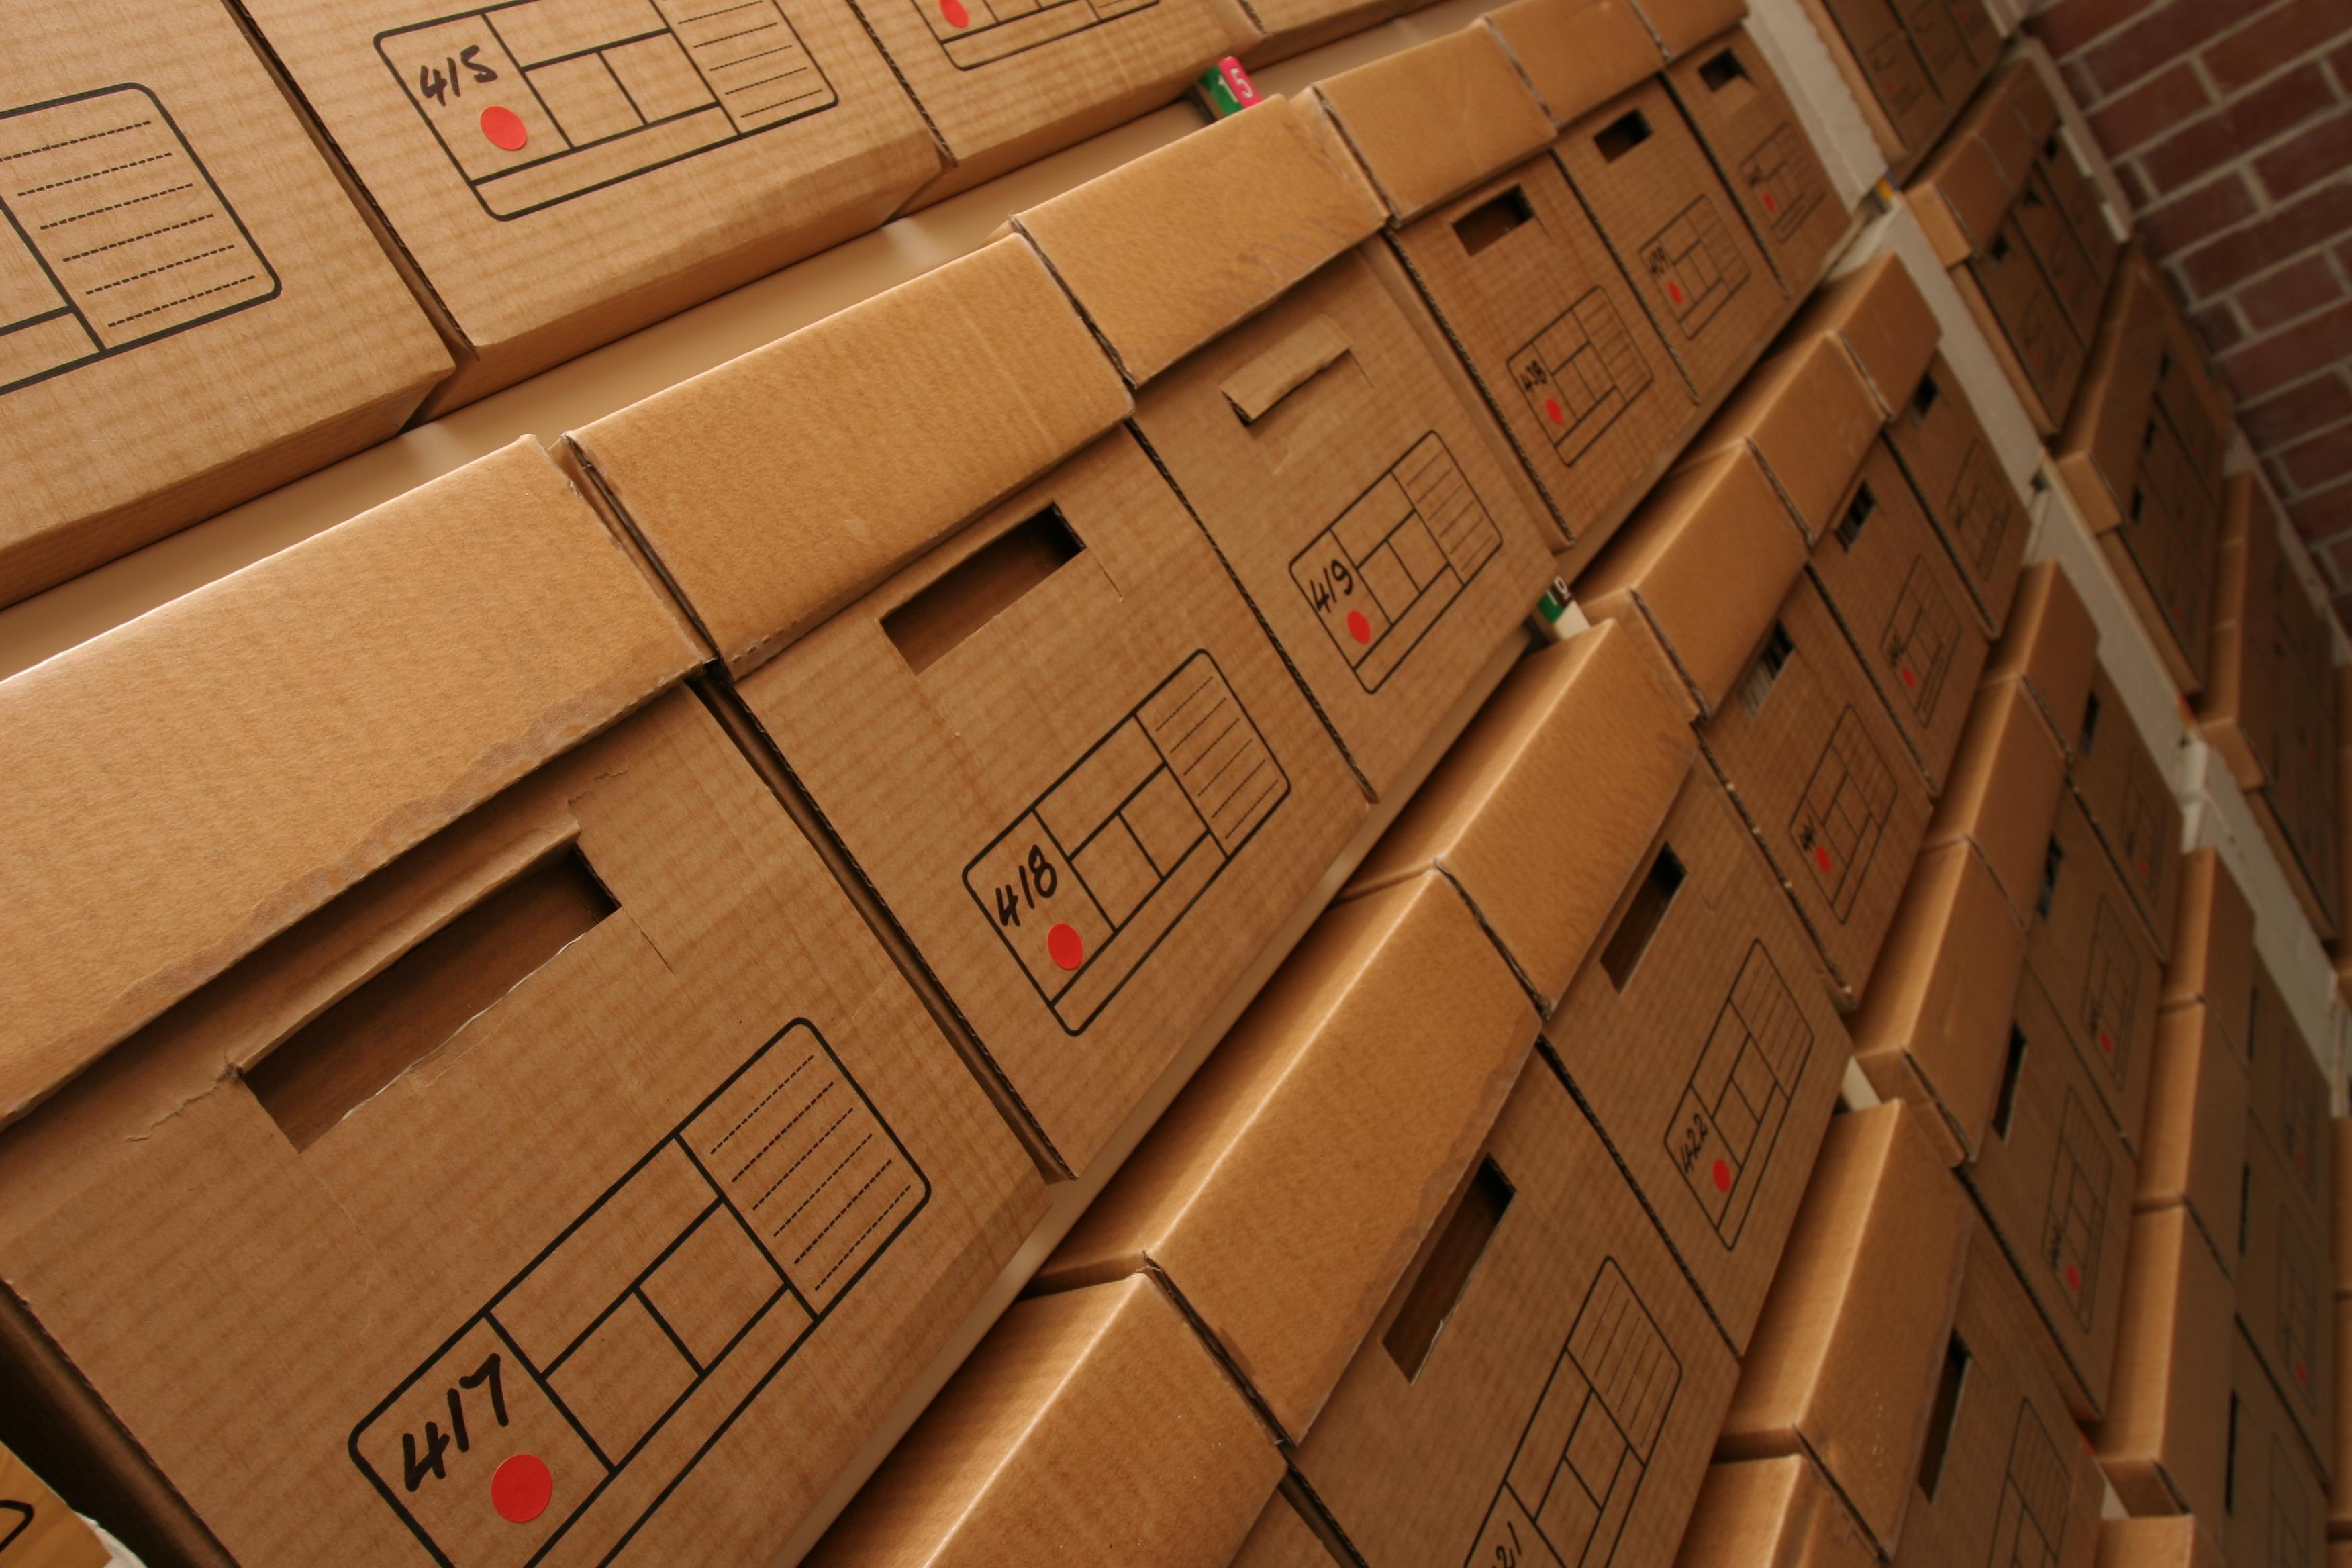 Stacks of cardboard storage boxes.